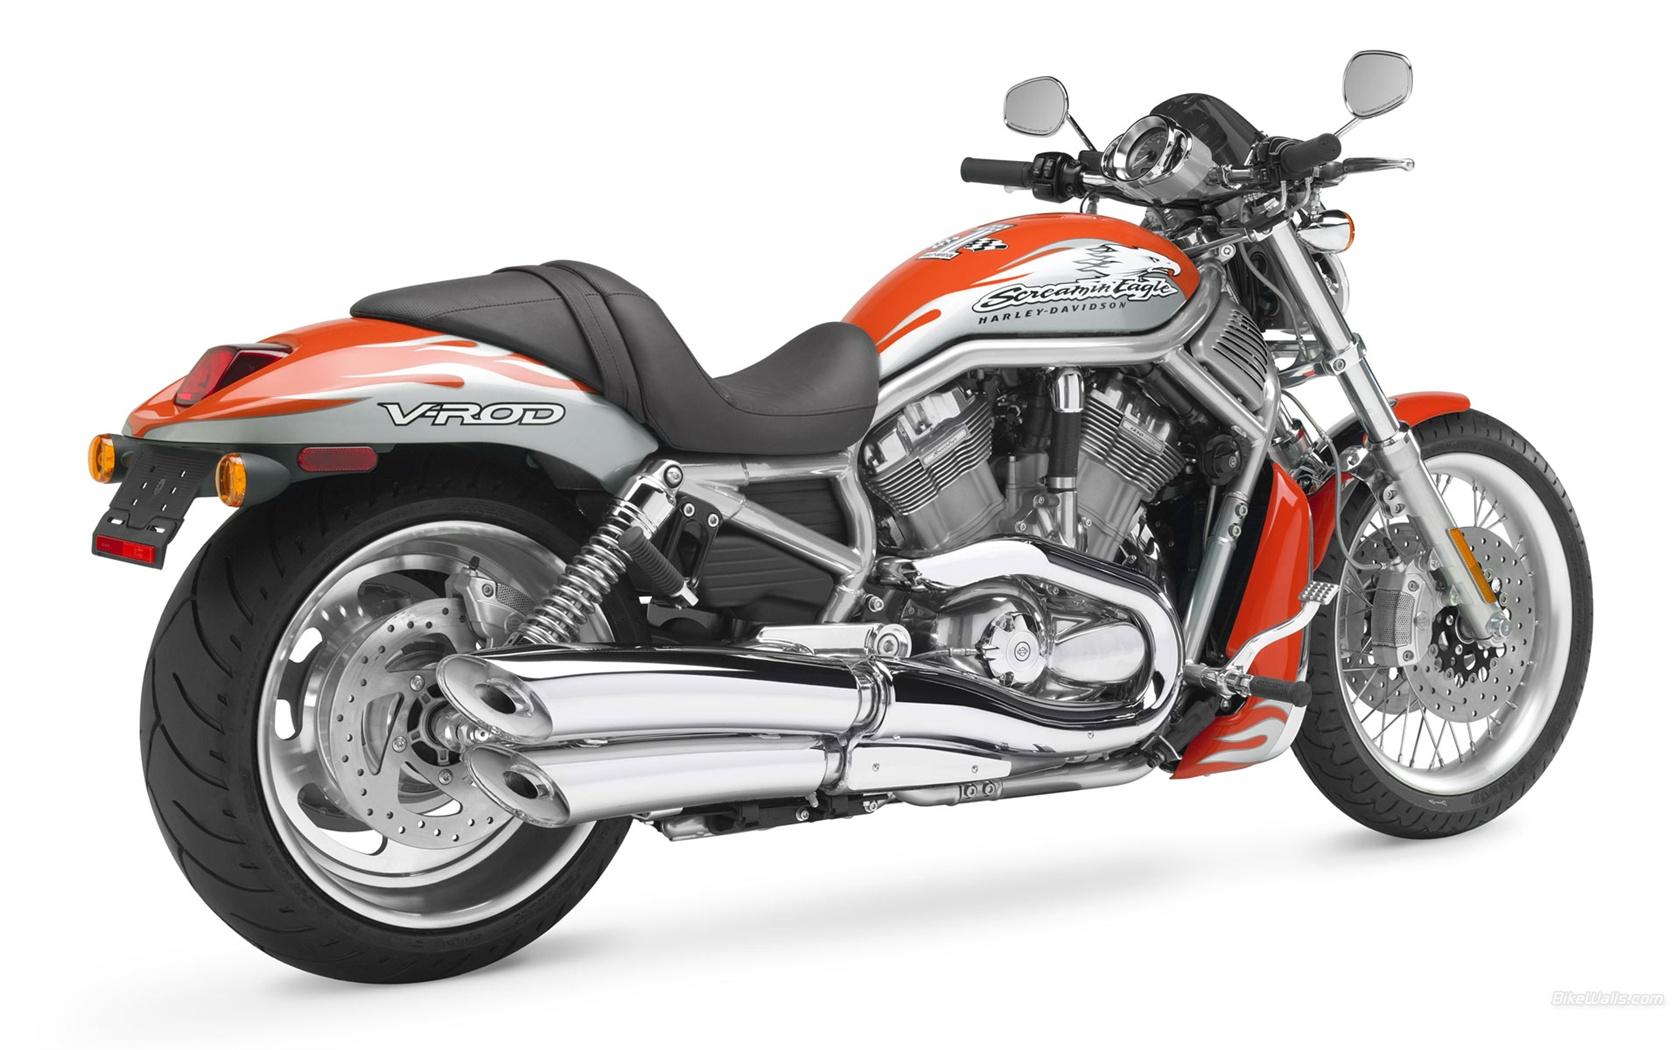 Wallpaper Harley Davidson V Rod Motorcycle 1920x1200 Hd Picture Image